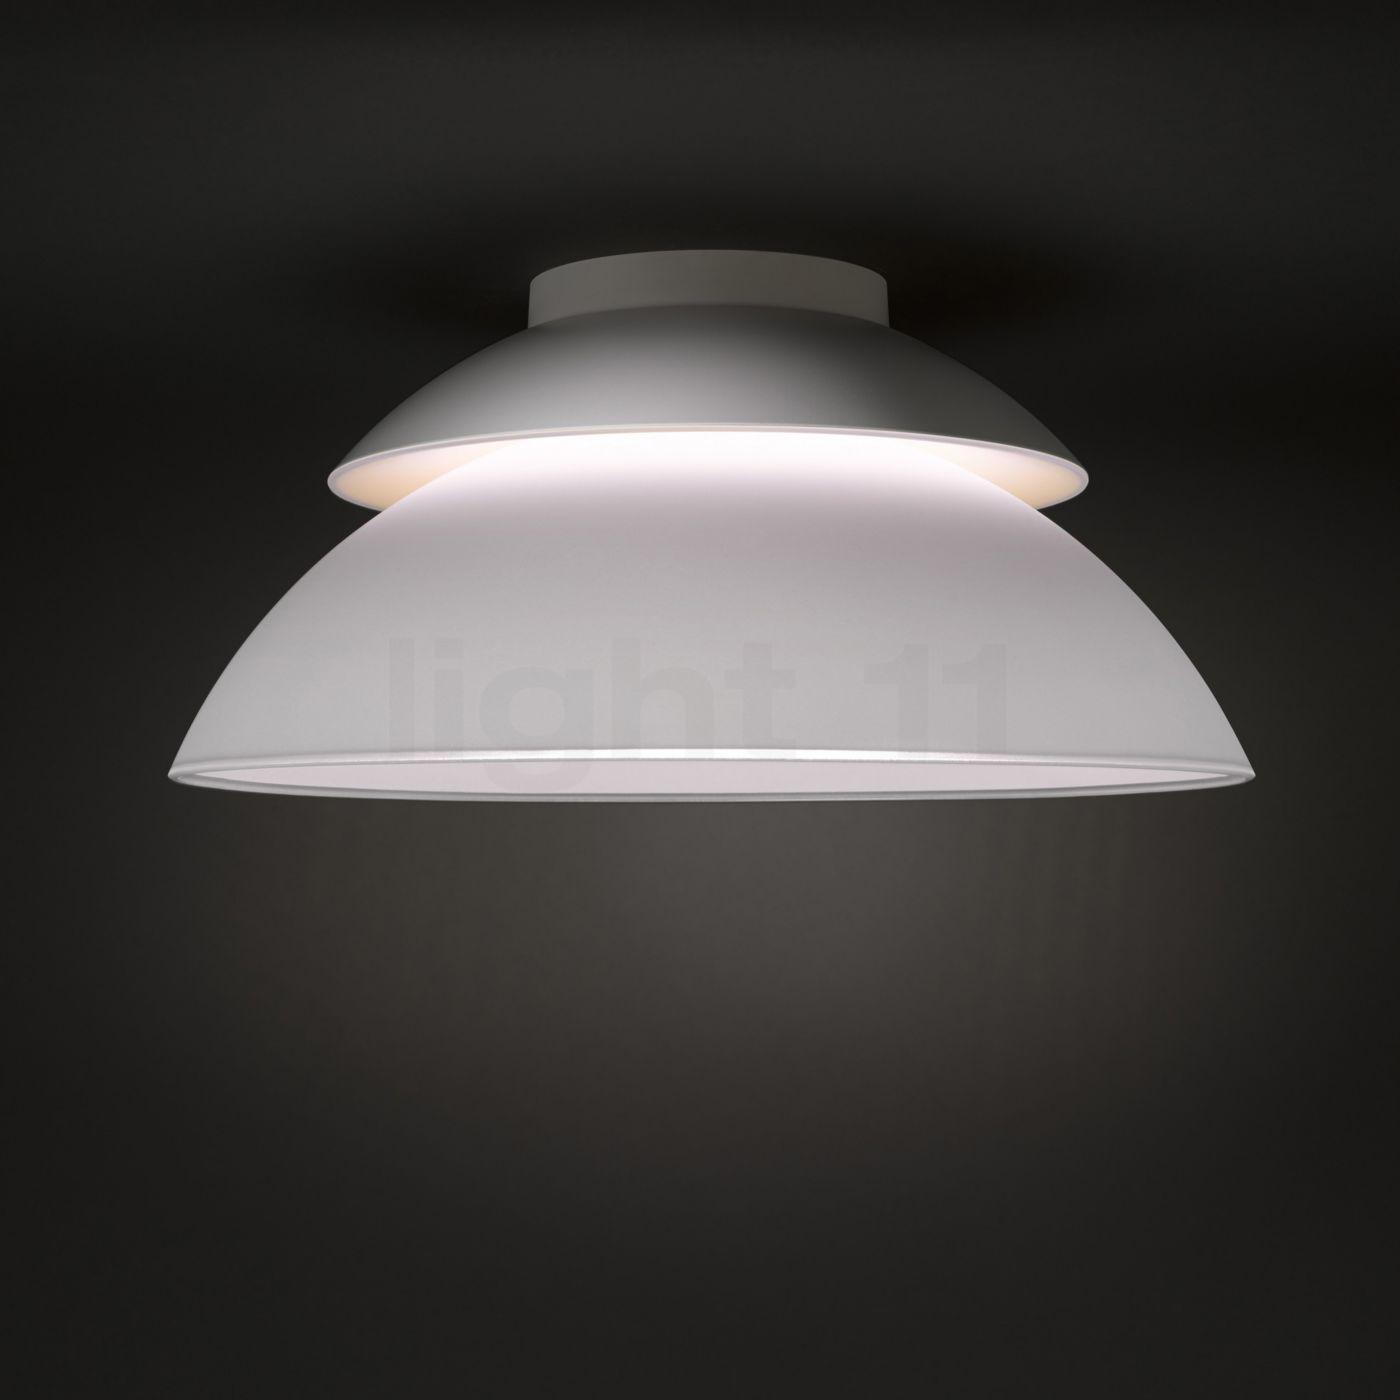 Philips hue beyond ceiling lights at light11 aloadofball Images